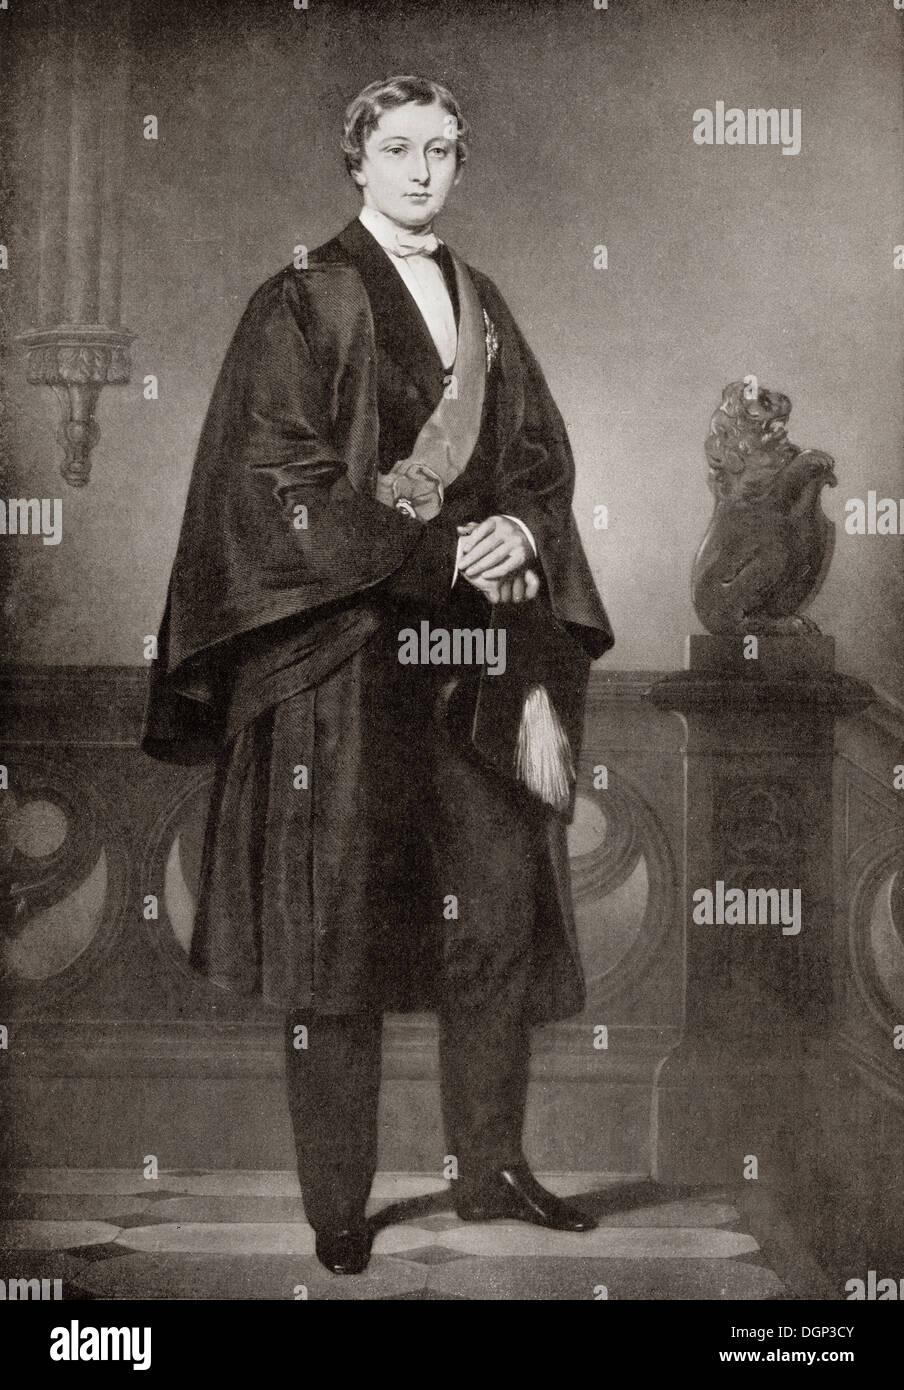 Albert Edward, Prince of Wales, 1841 – 1910, future King ...